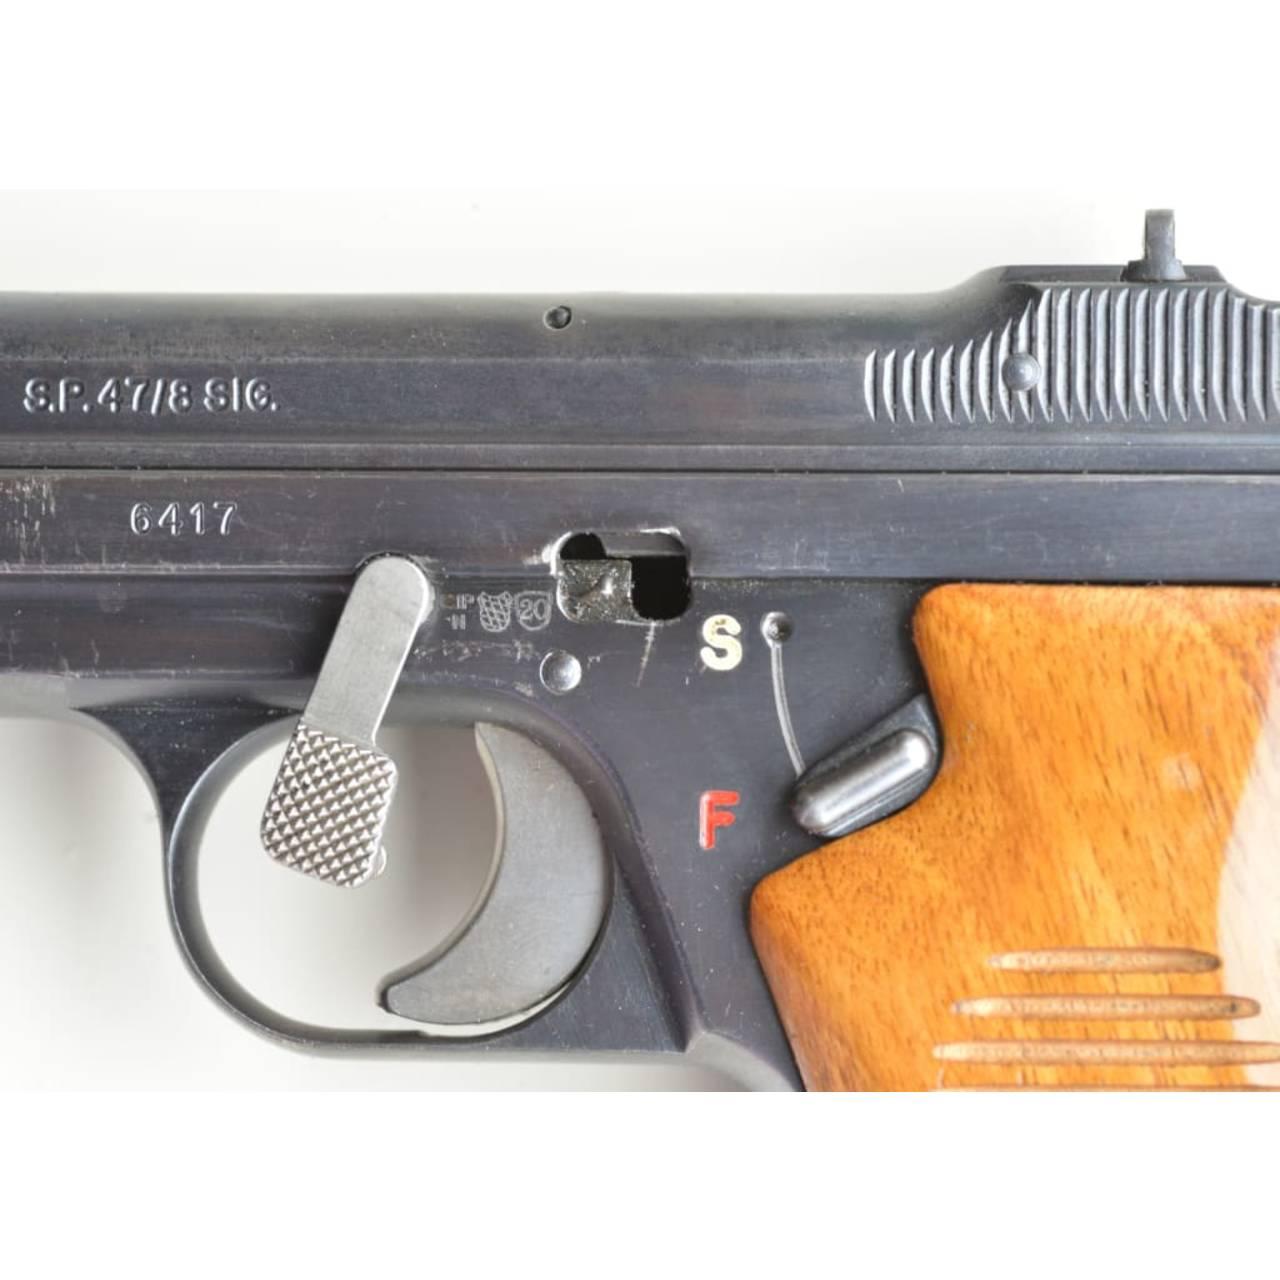 SIG SP 47/8, Schwedenmodell